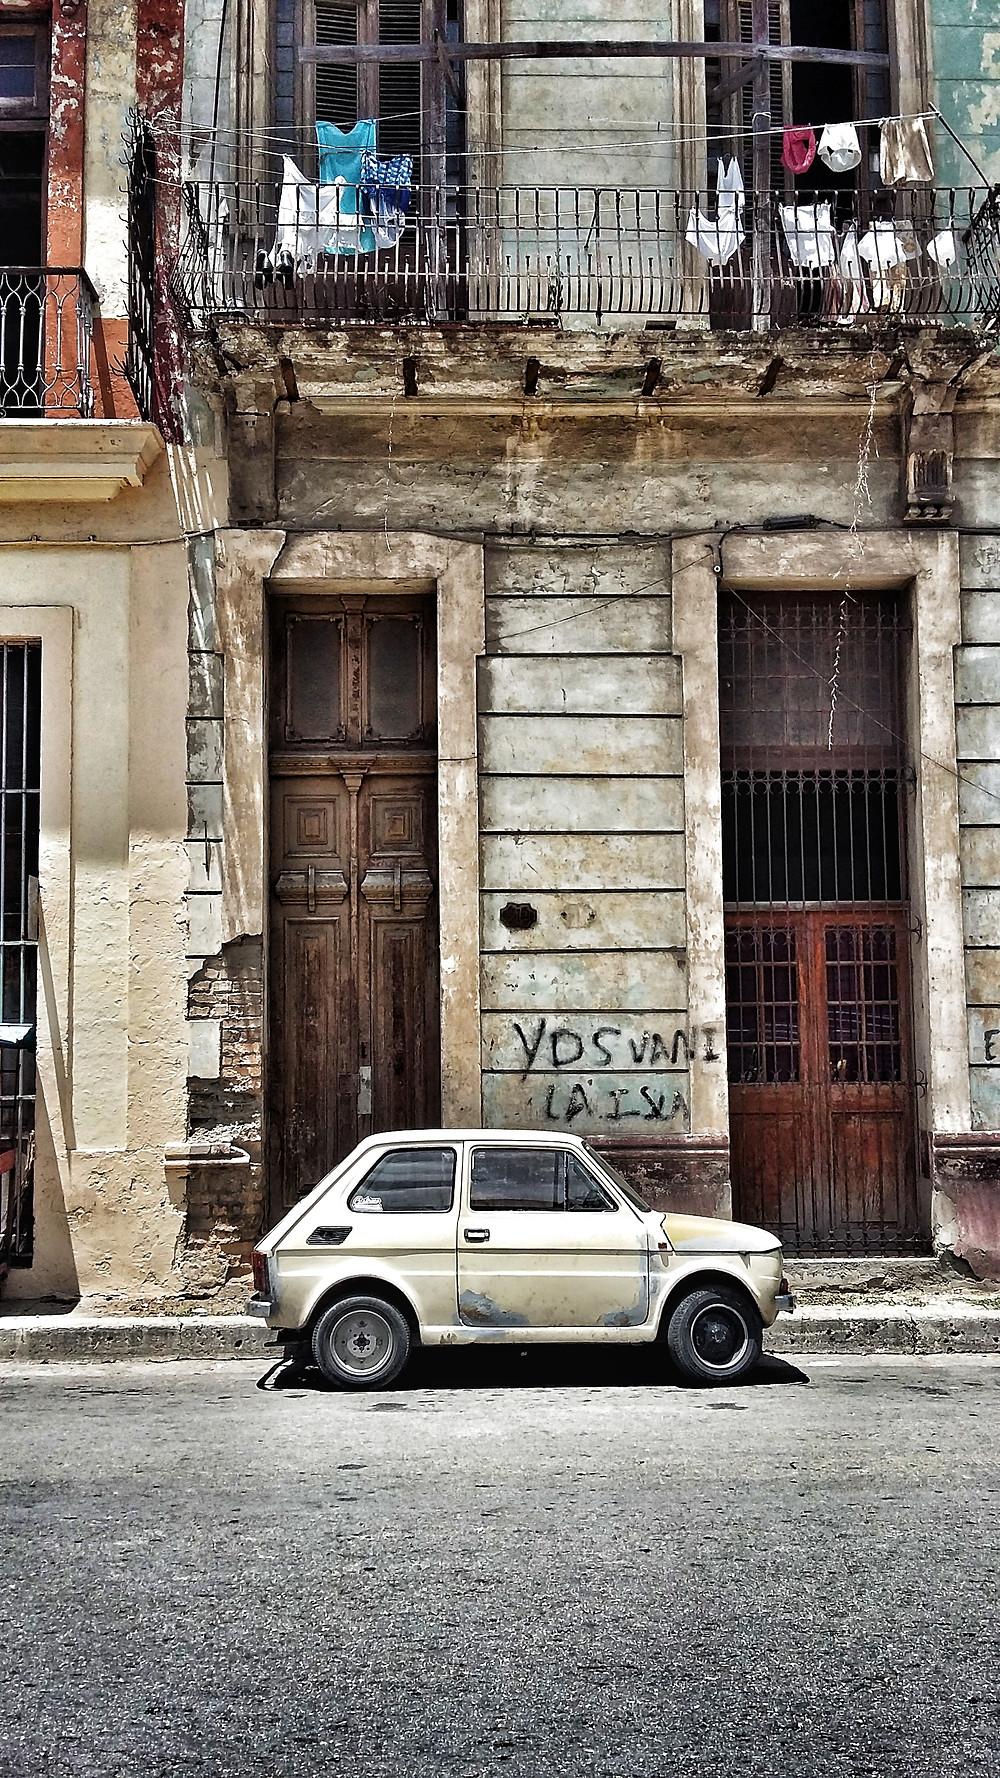 Polski Fiat 126 in Havana, Cuba